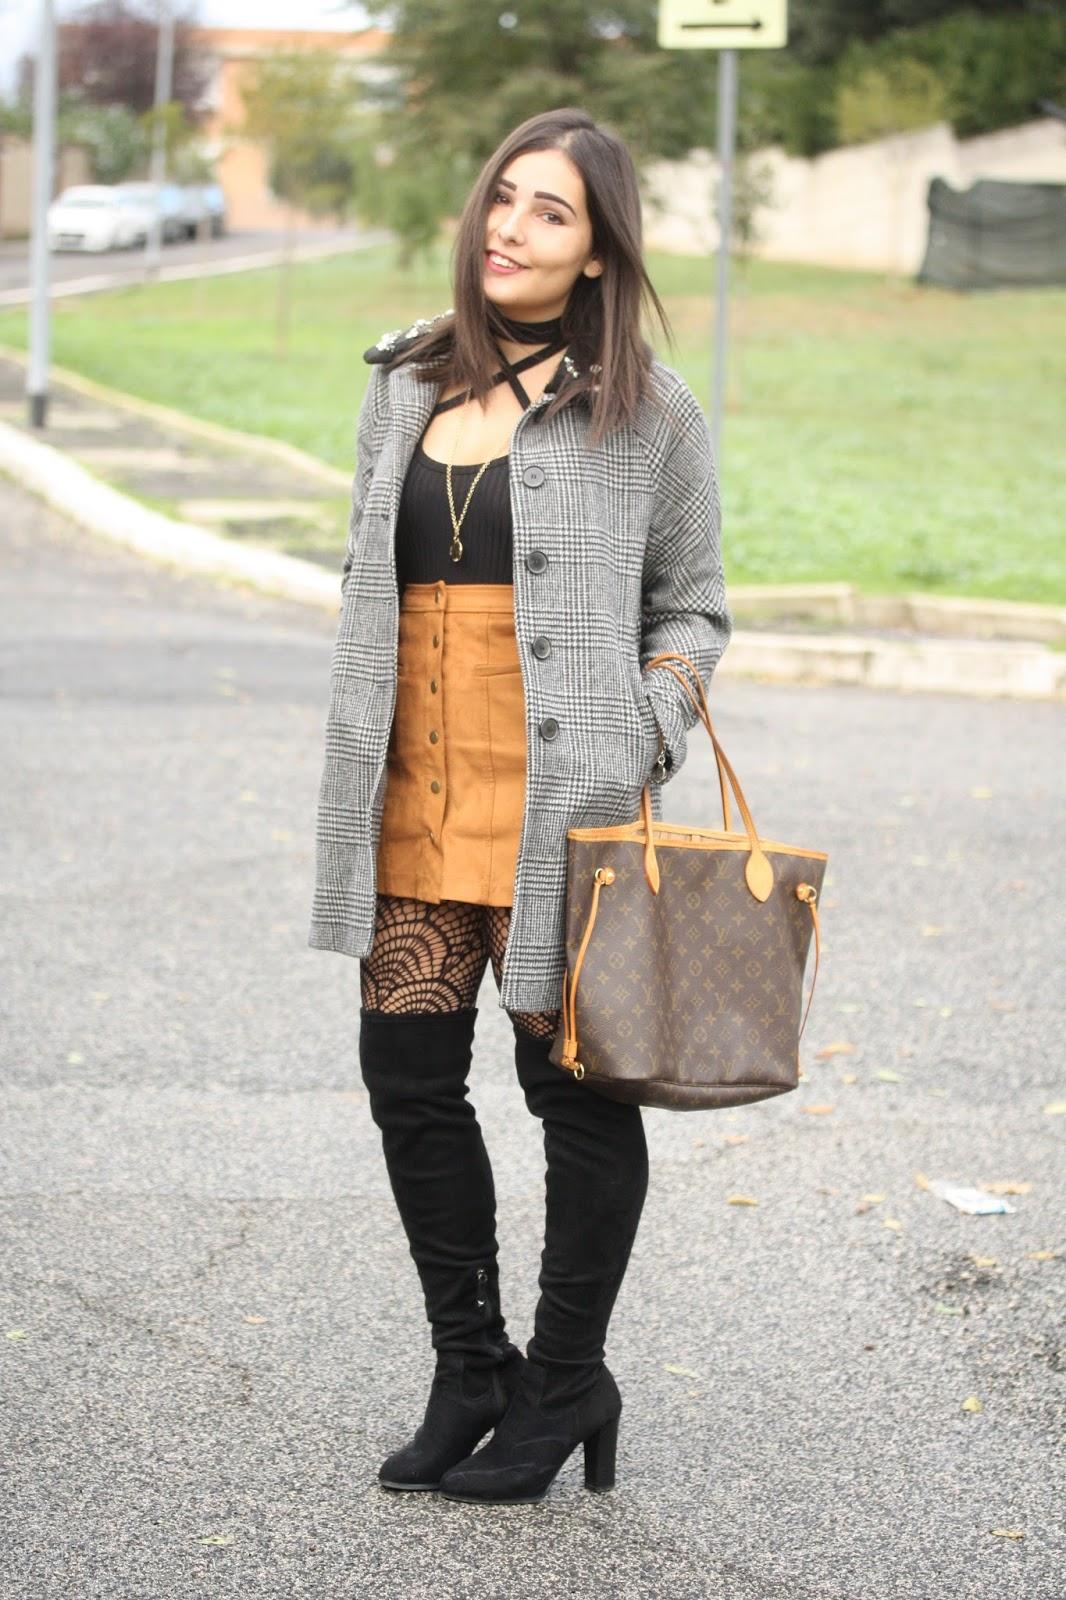 the latest 8de34 5c4fe Only Shopping Blog - Fashion Blogger: Con una gonna ...